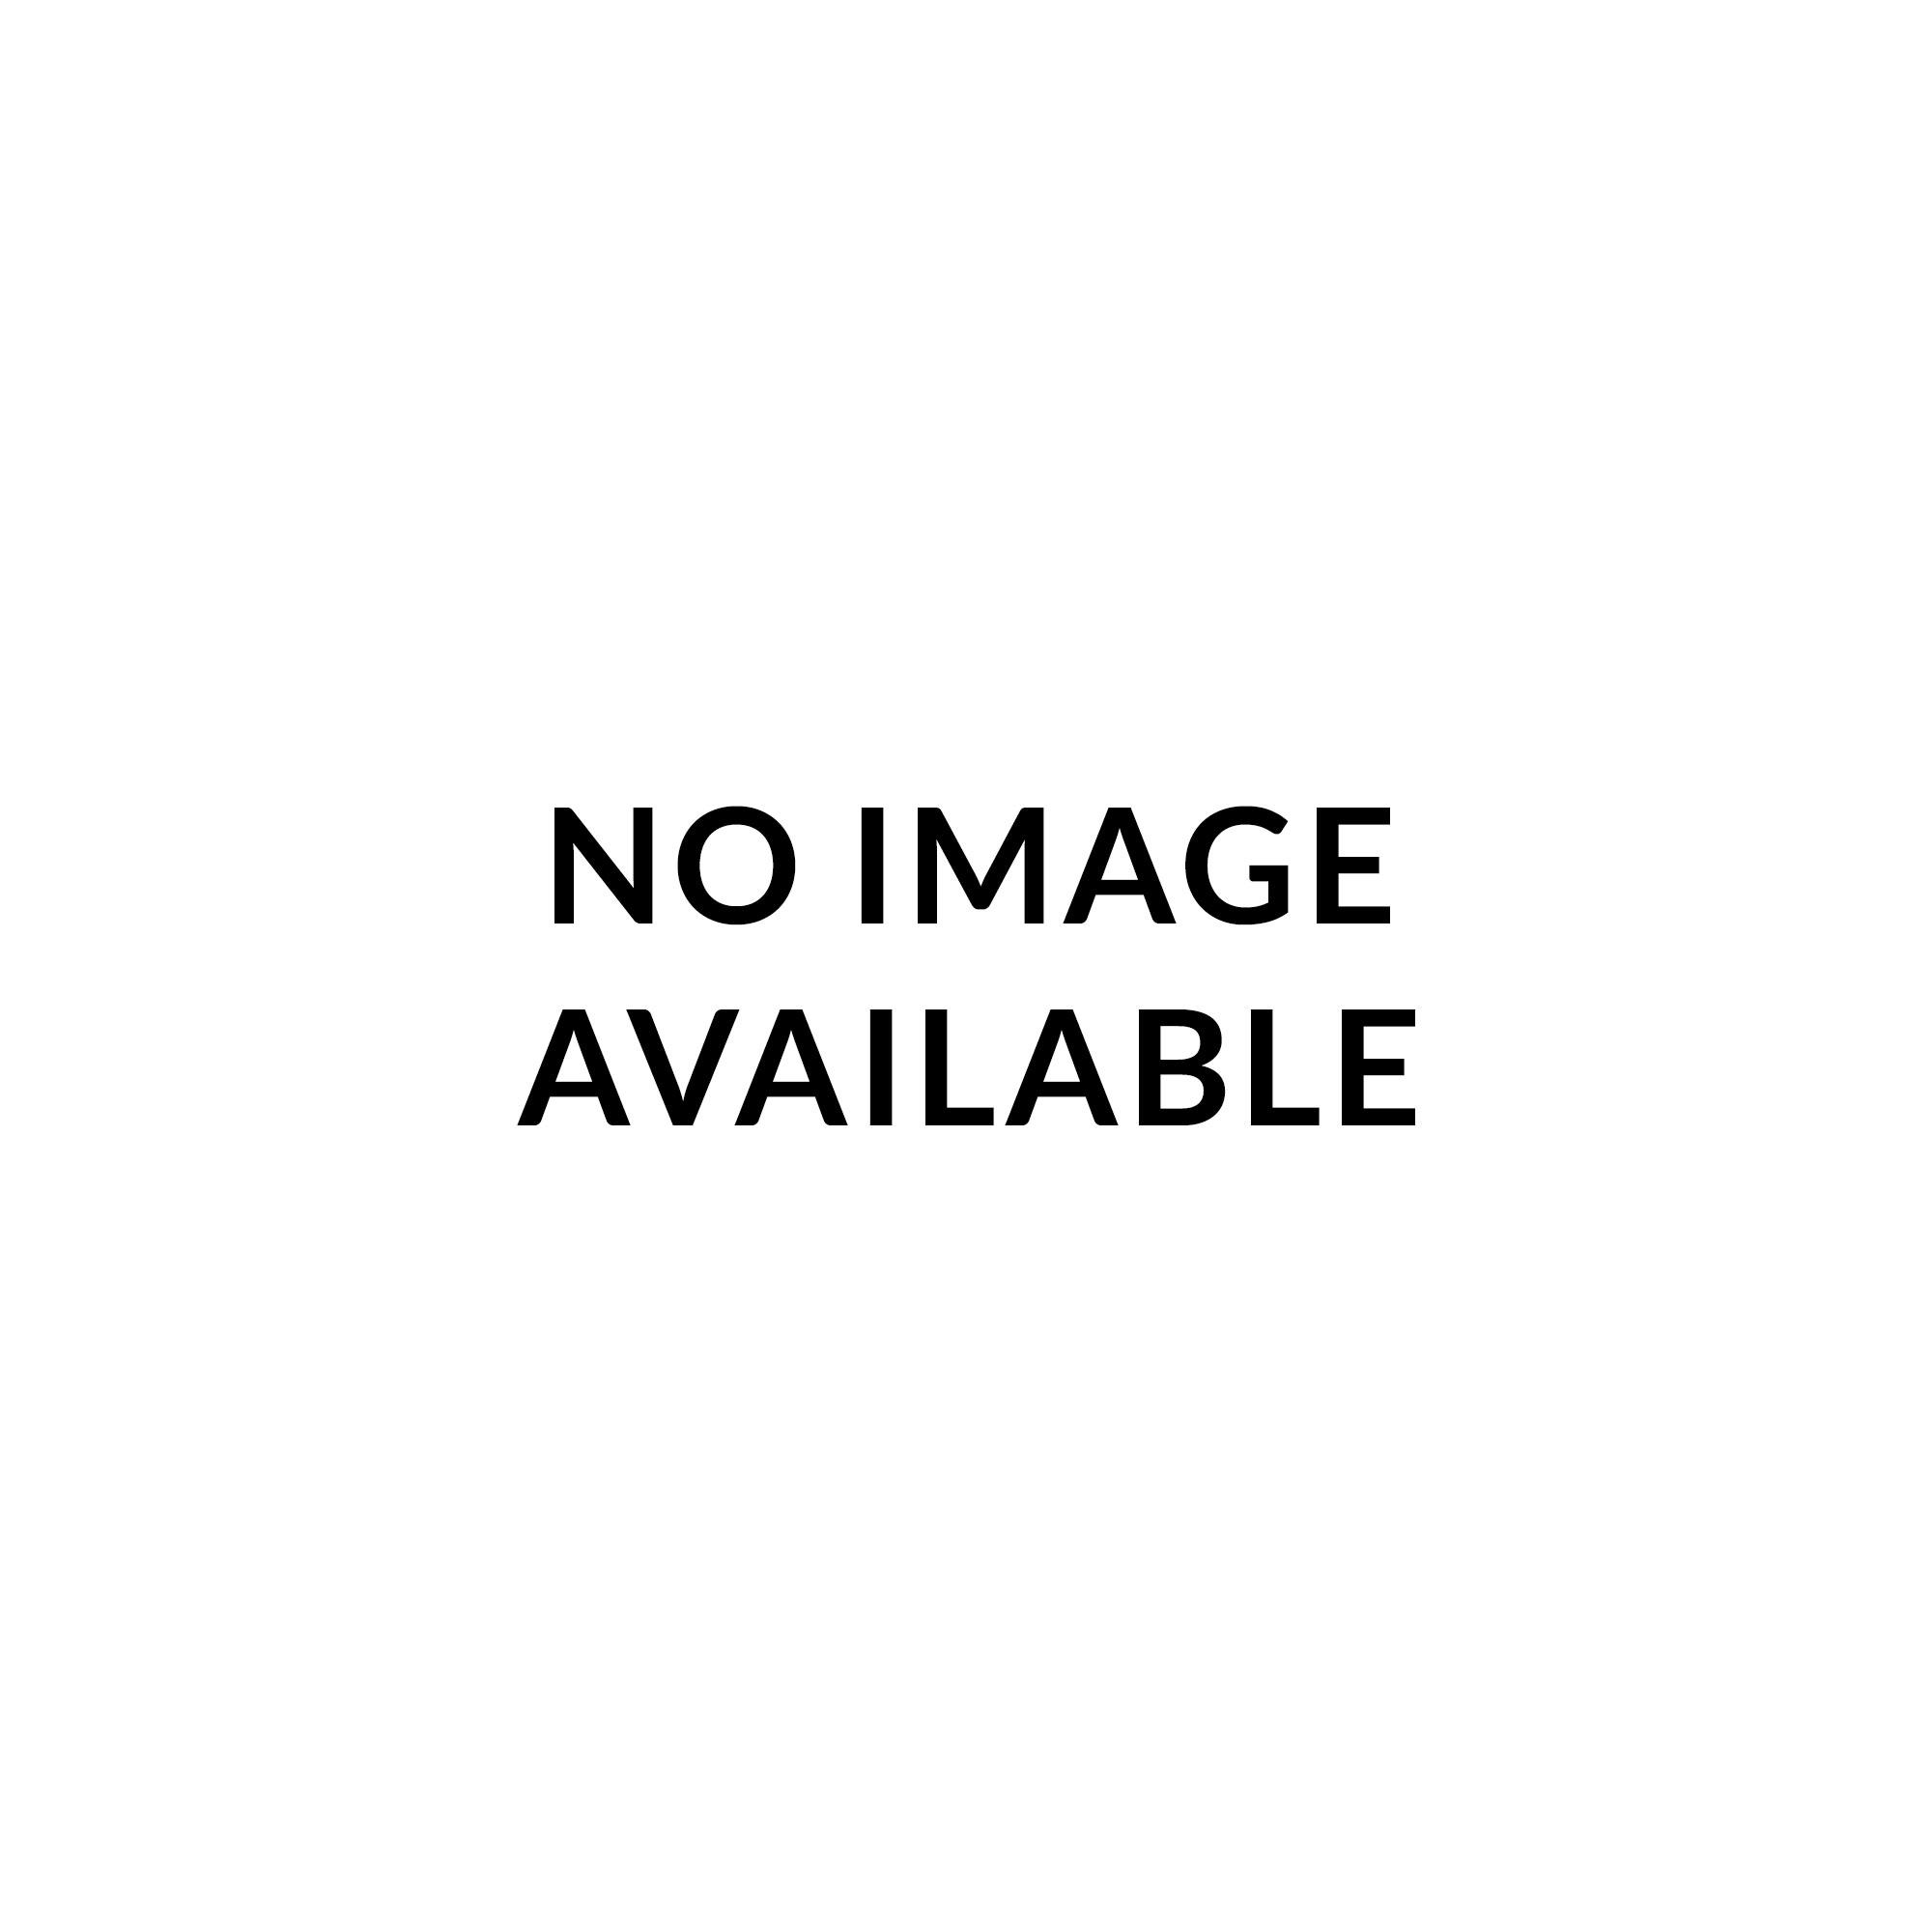 D'Addario NYXL High Carbon Plain Steel Single Strings, Twin Packs (Gauges .007-.026)